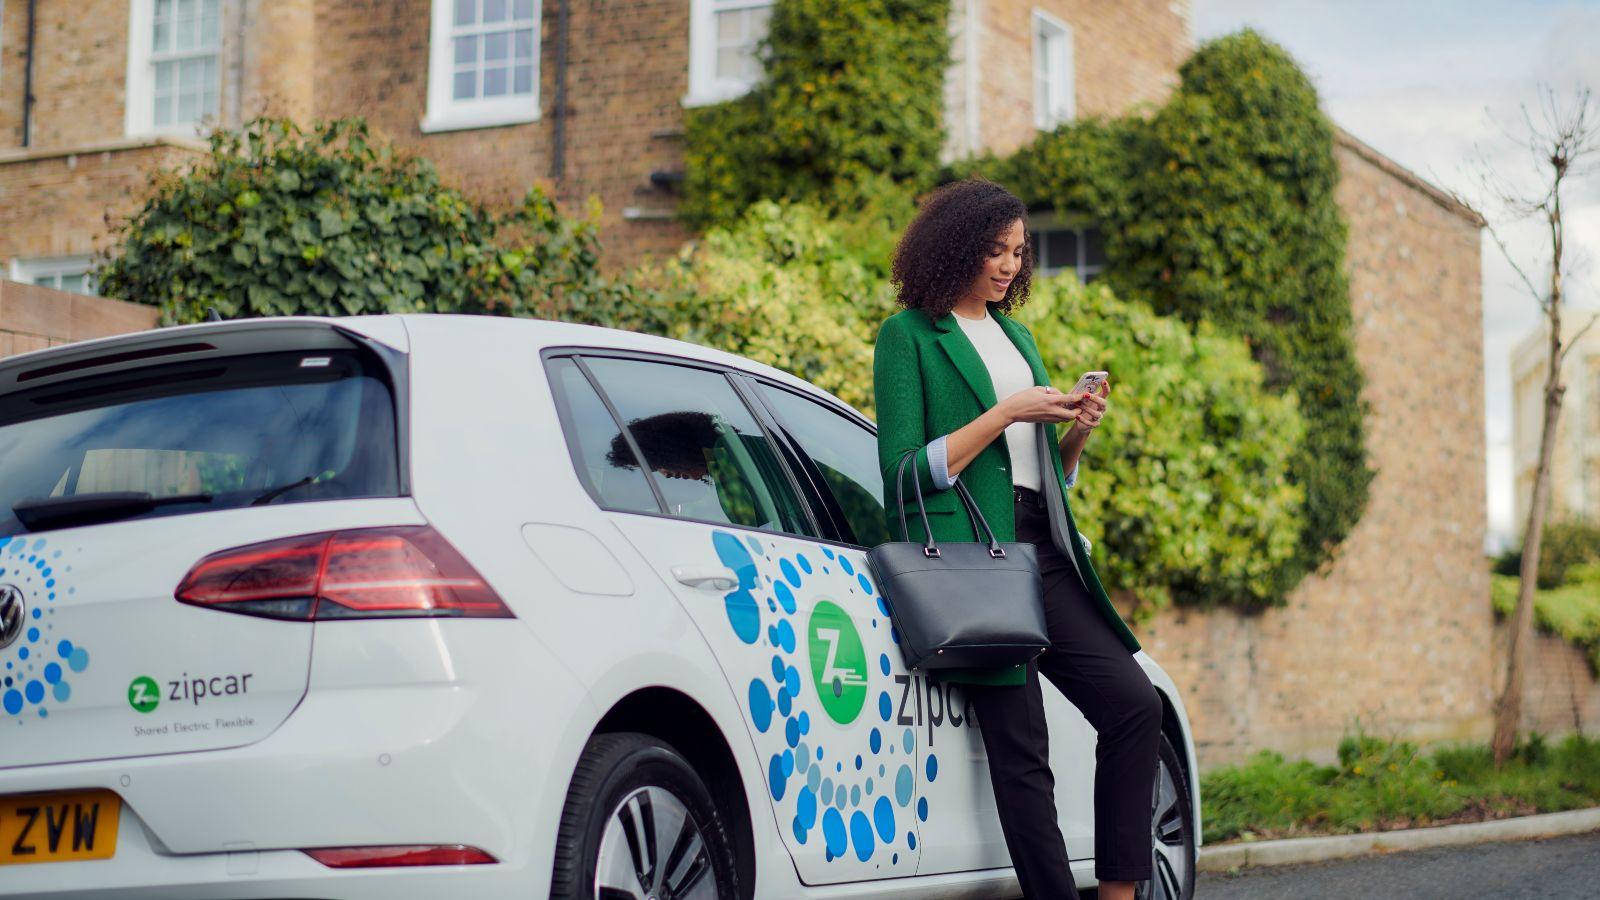 renting an electrc car